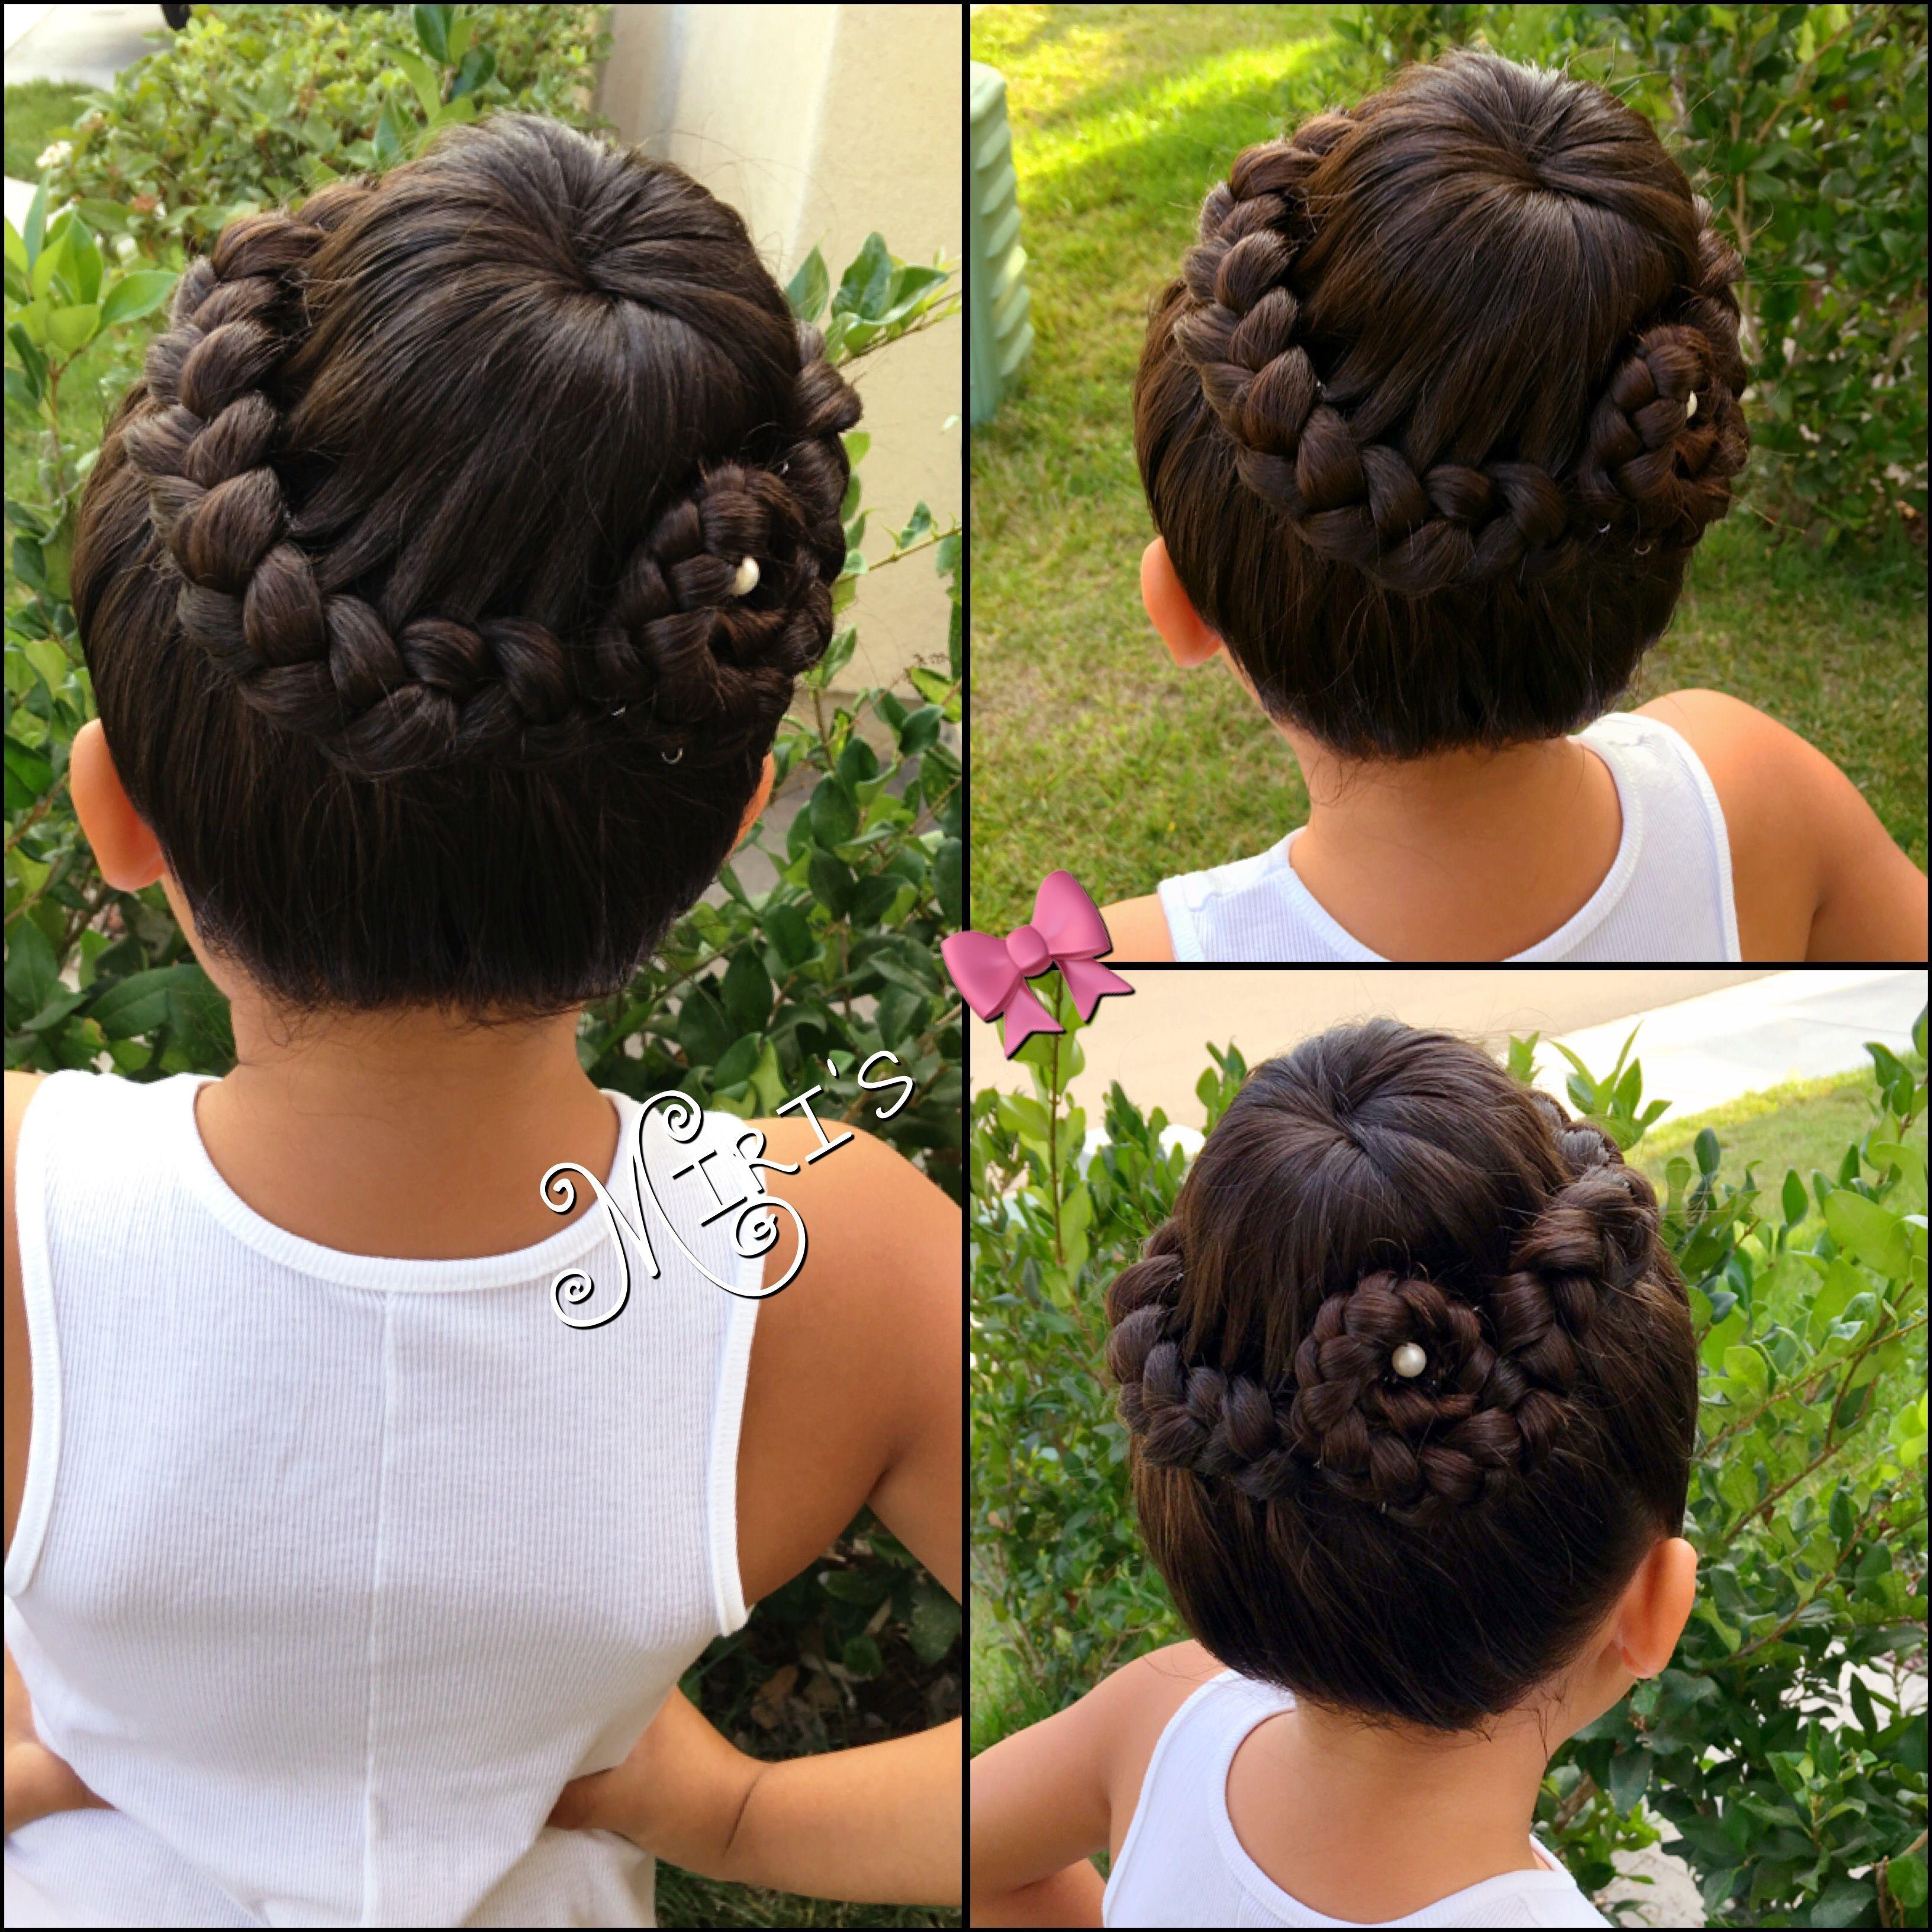 Bun hair style for little girls   Kids hairstyles, Hair ...